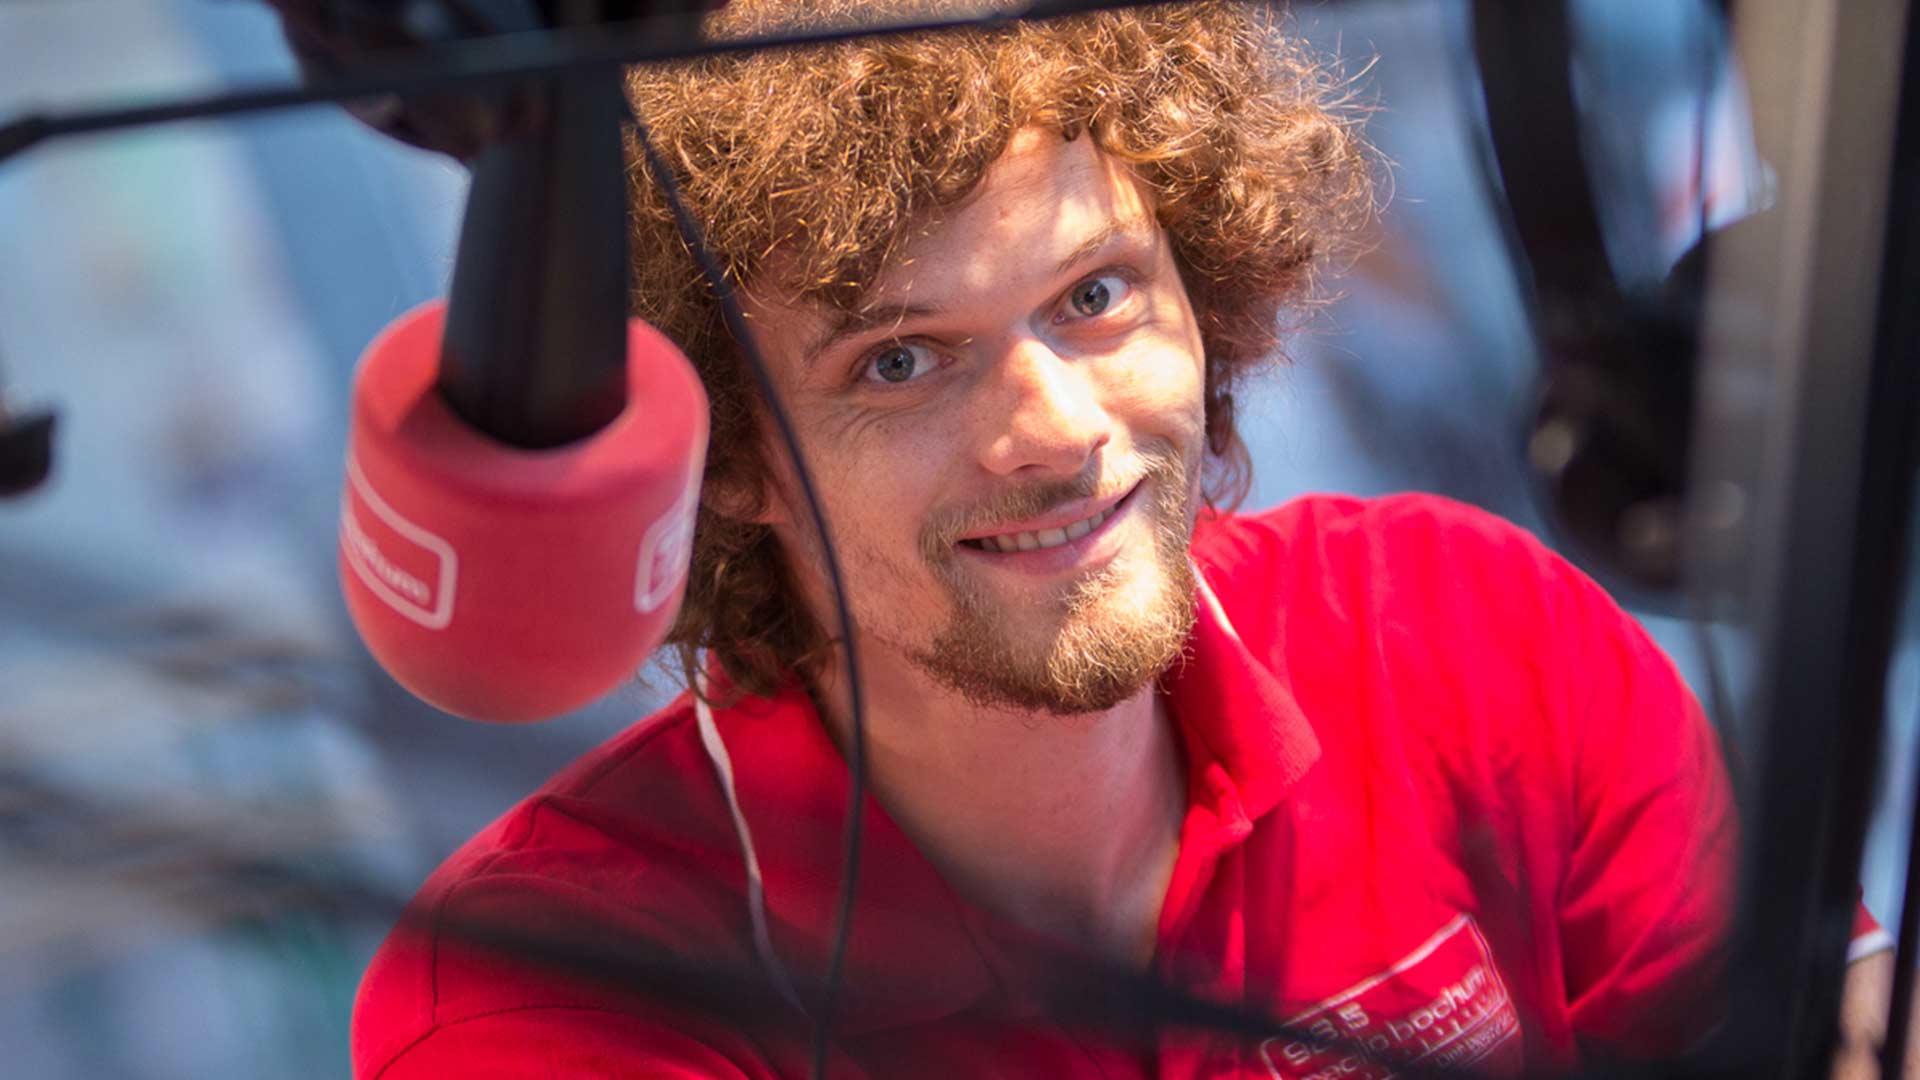 Felix Groß moderiert Radio Bochum am Morgen. Foto: Westfunk